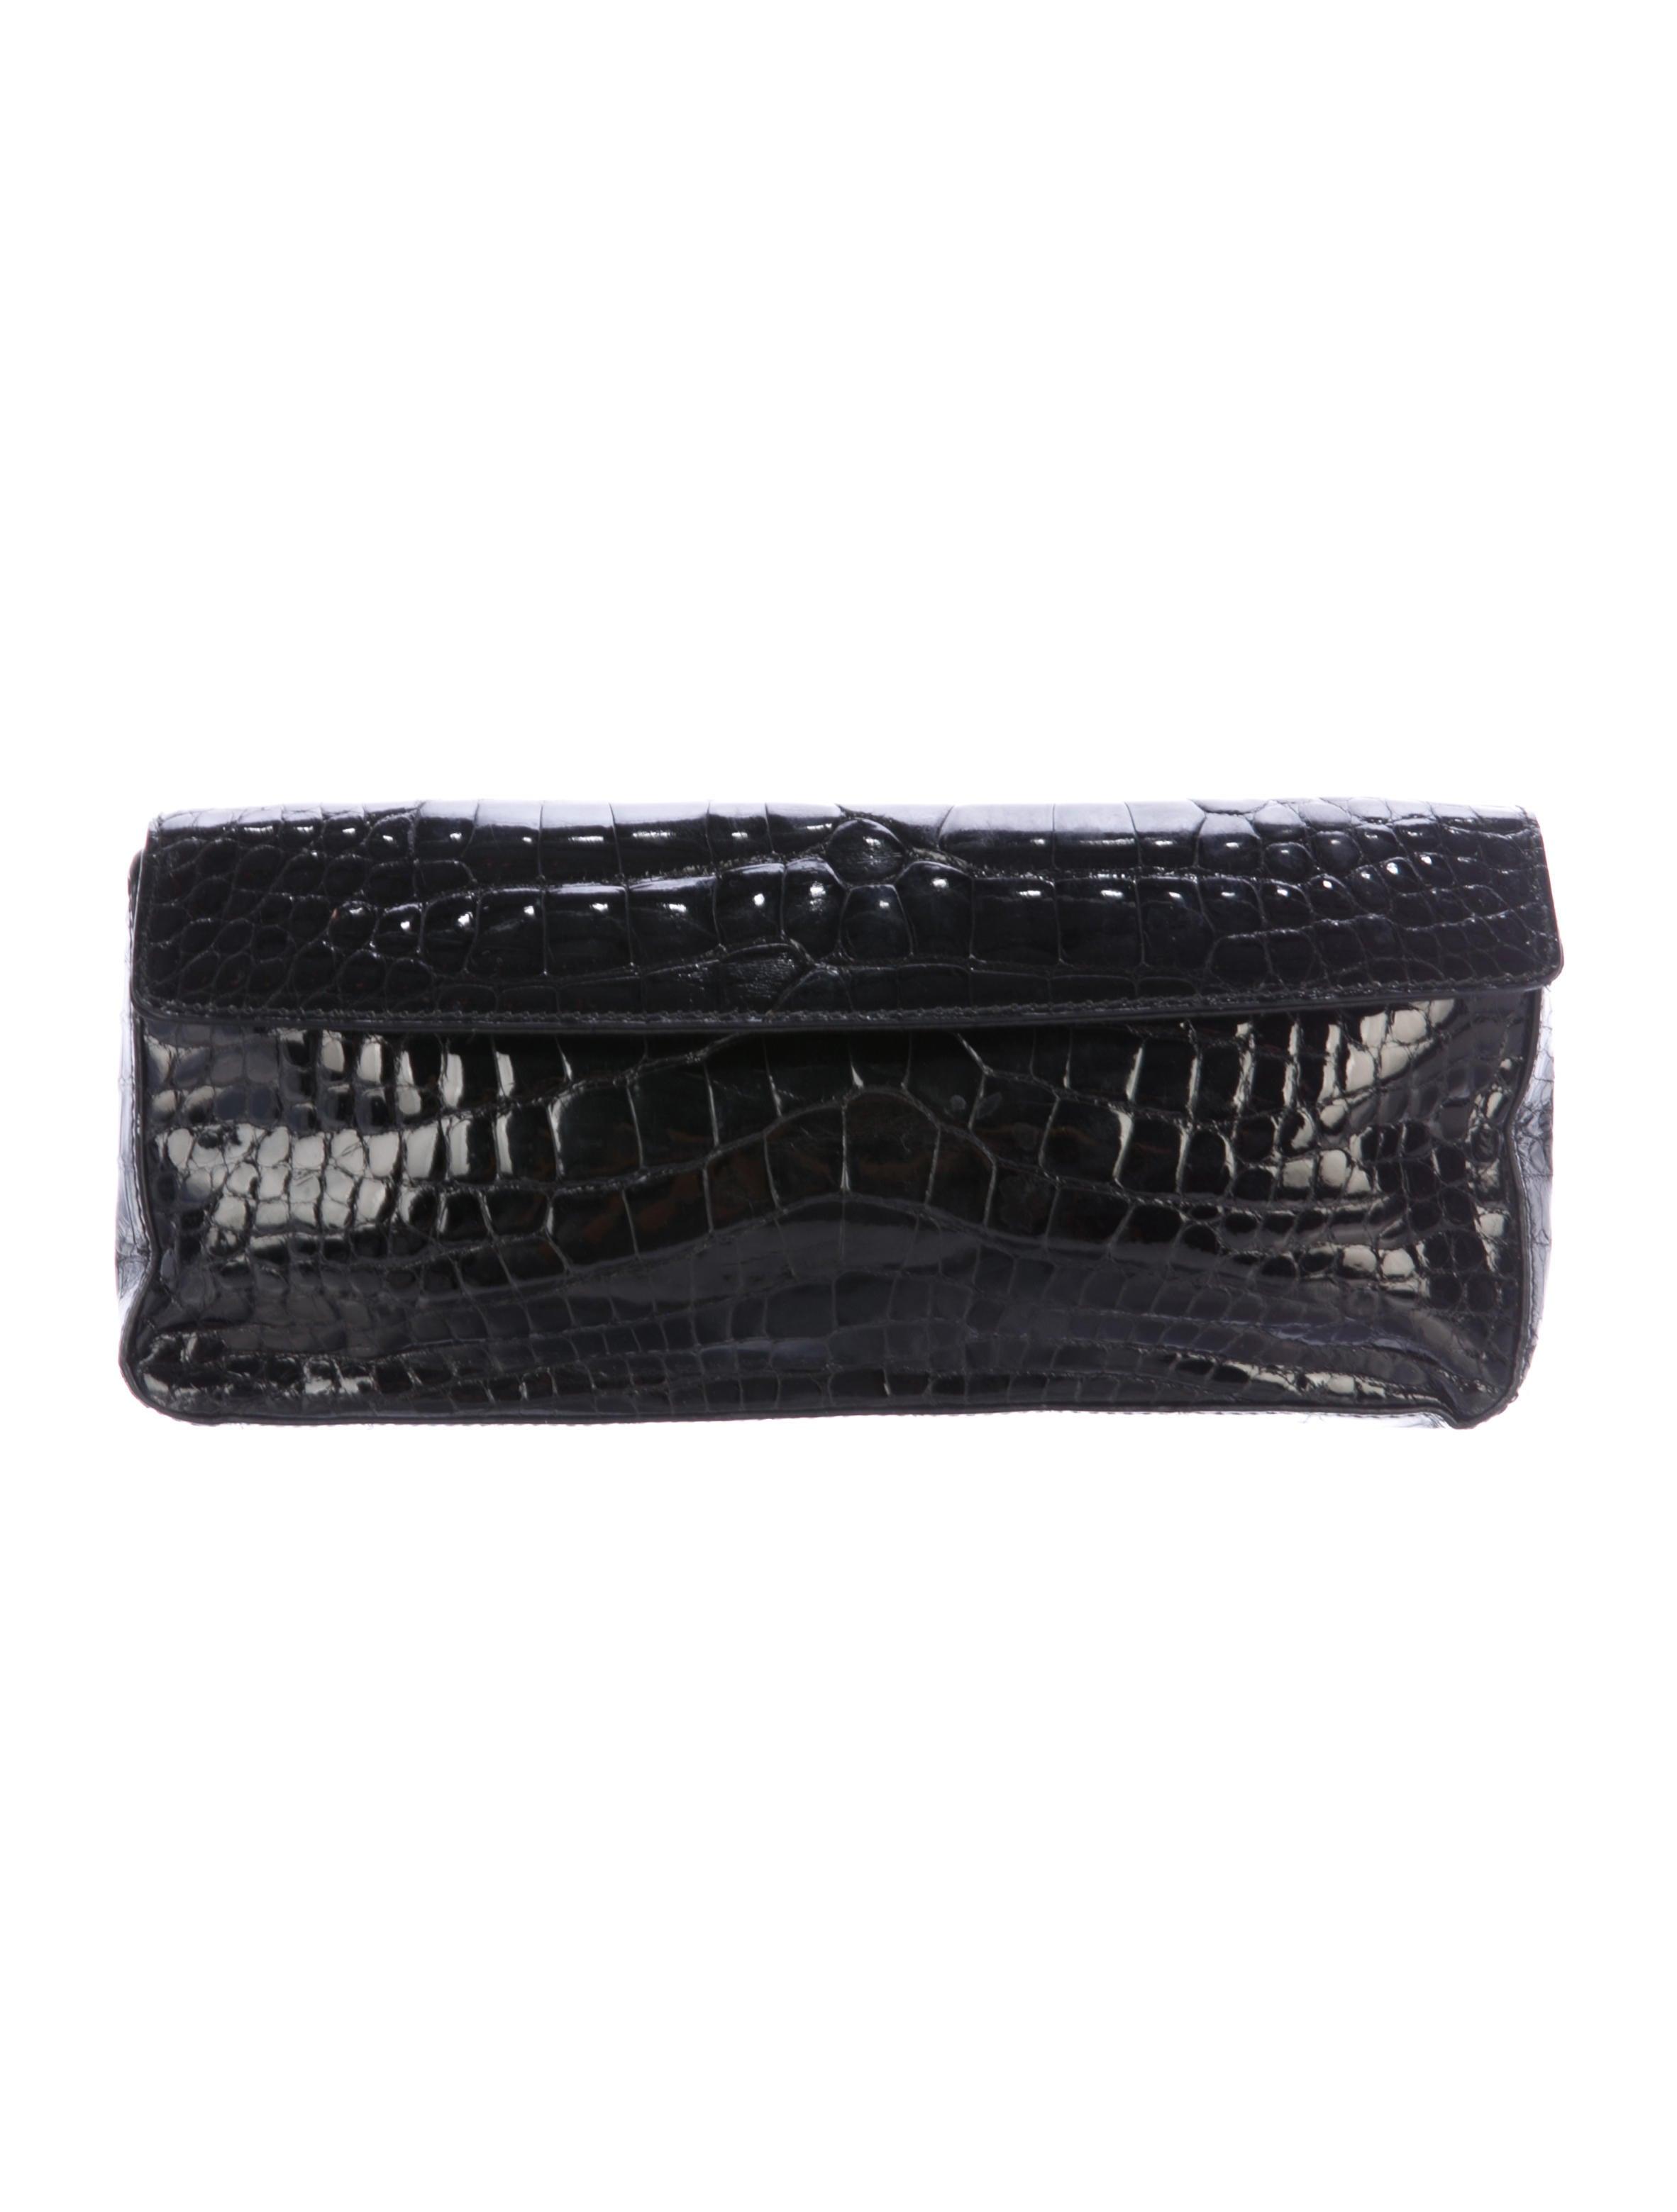 b85f252ae176 Prada Glazed Crocodile Clutch - Handbags - PRA249320 | The RealReal